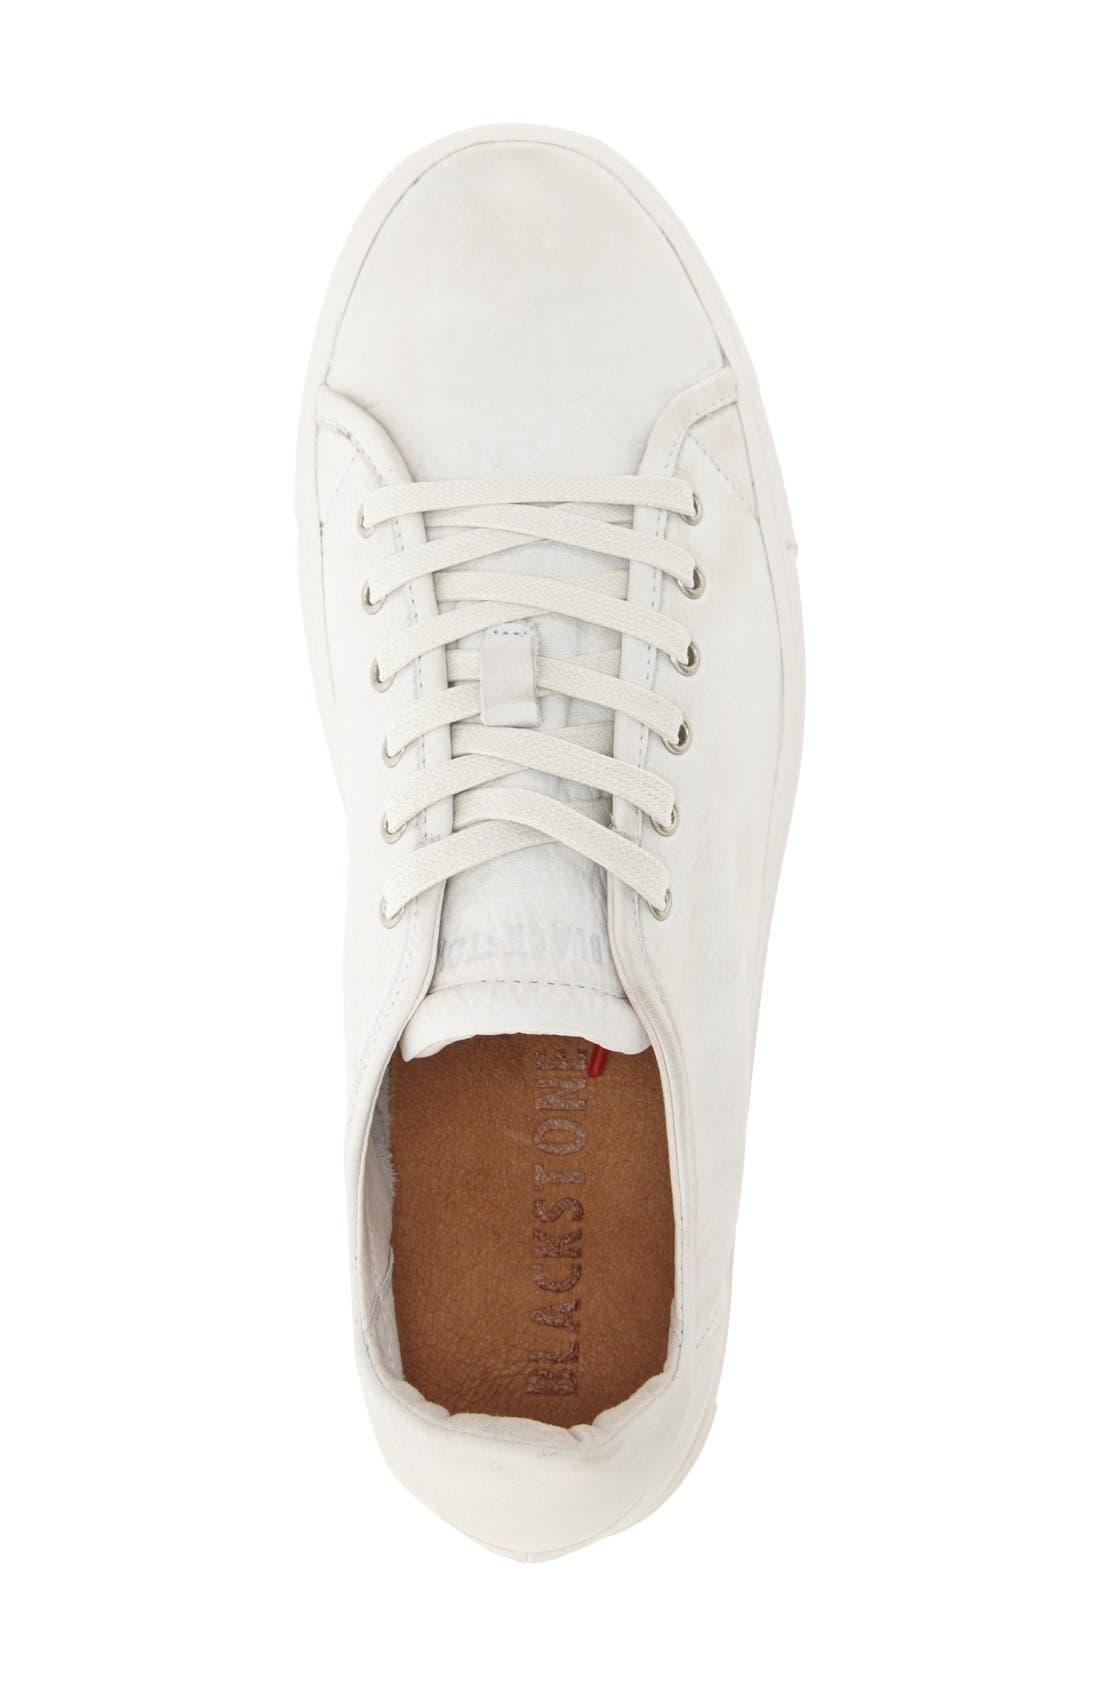 Blacktone 'LM24' Sneaker,                             Alternate thumbnail 3, color,                             White